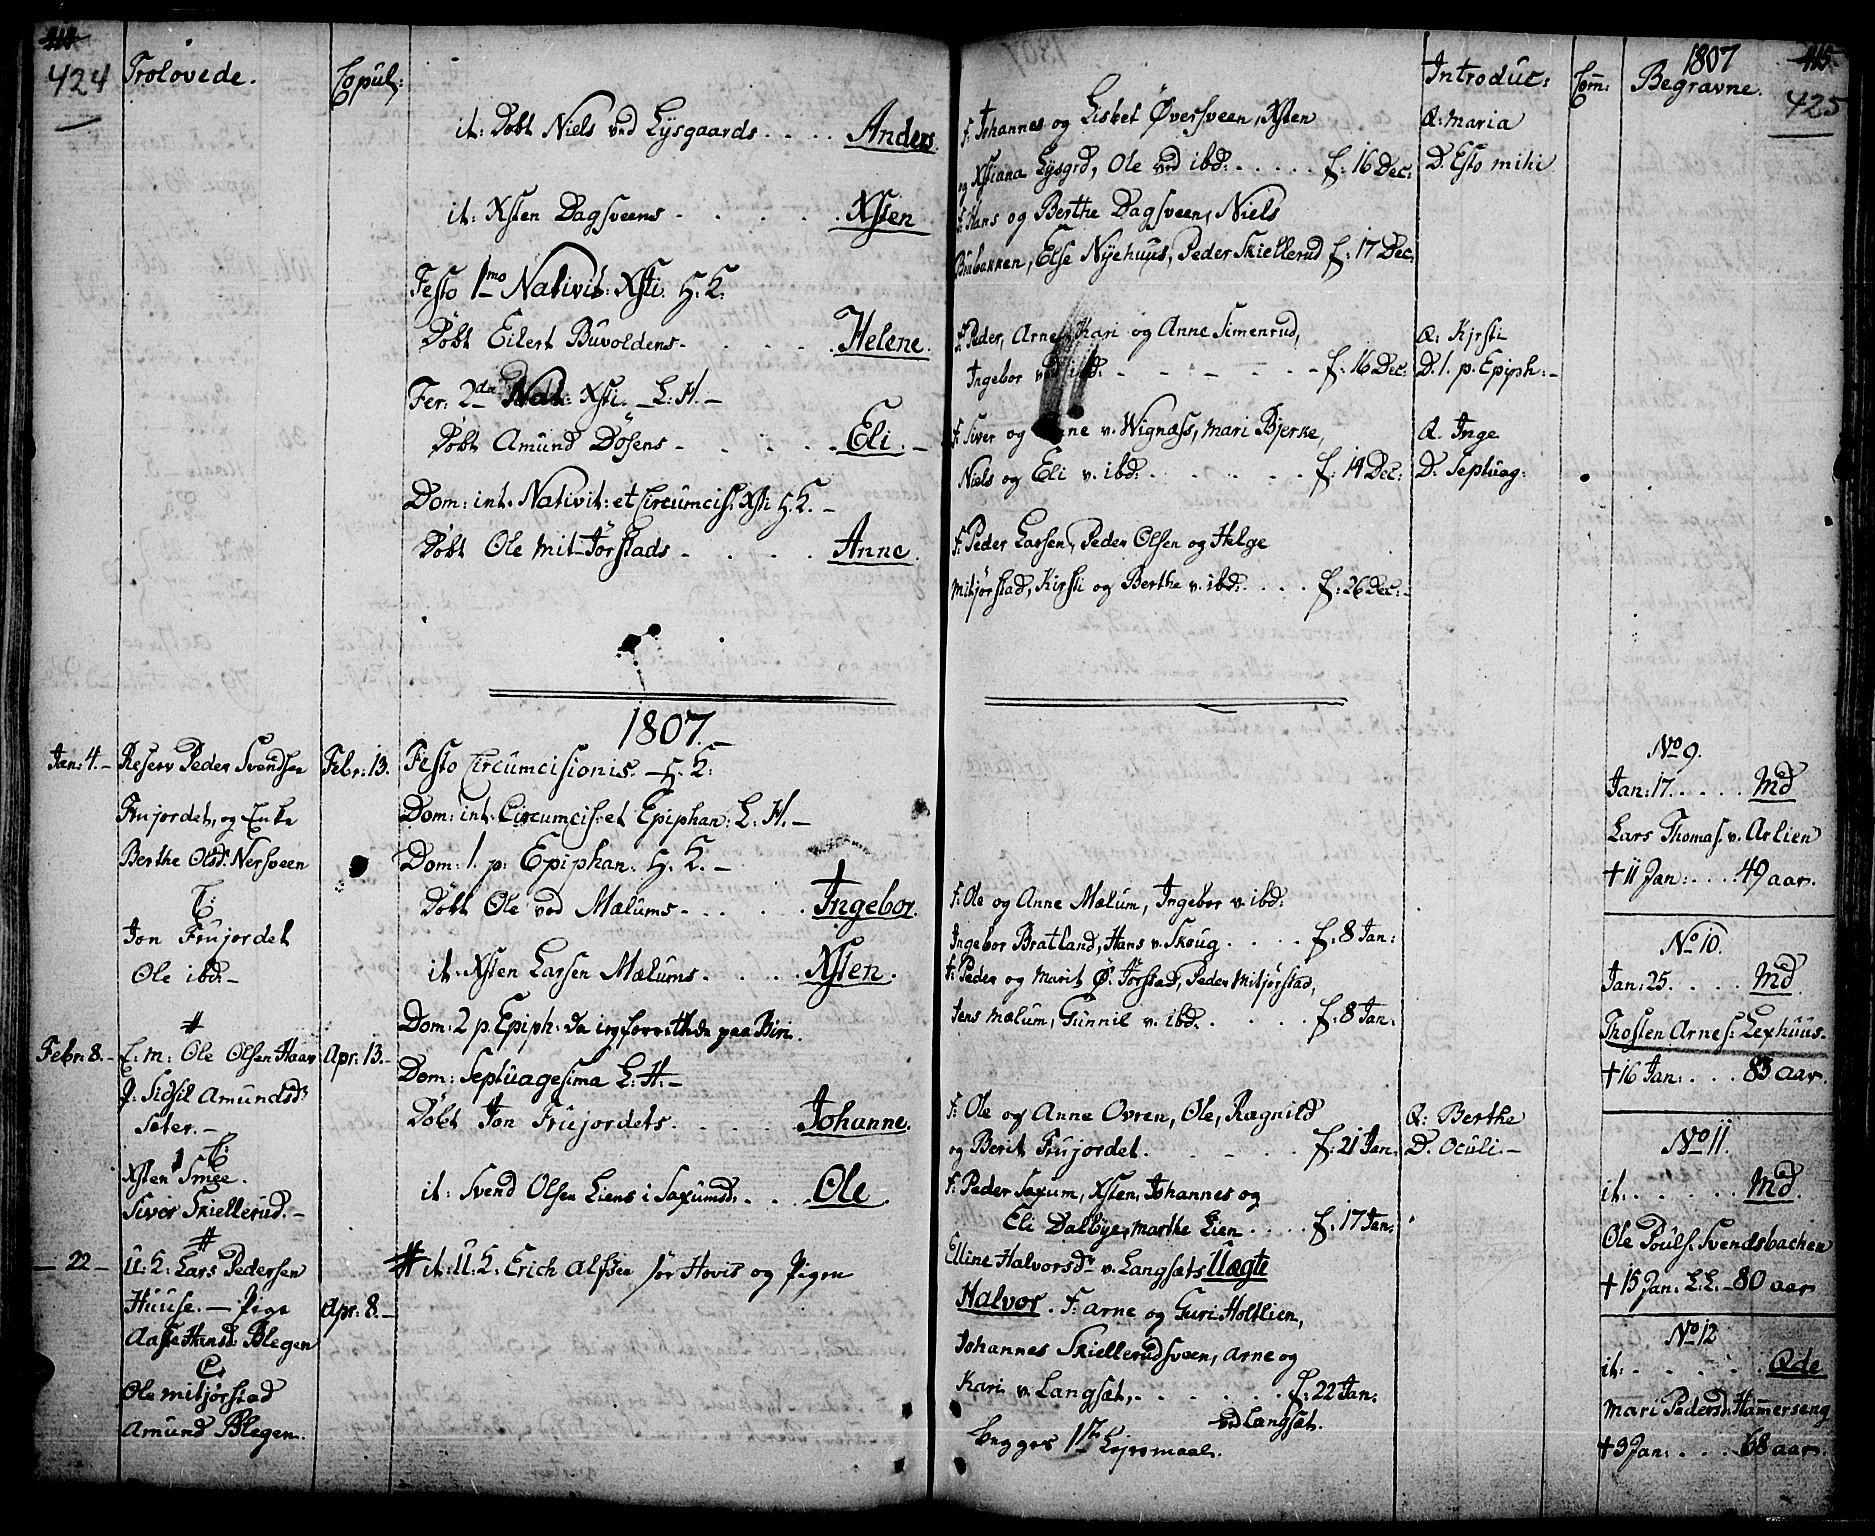 SAH, Fåberg prestekontor, Ministerialbok nr. 2, 1775-1818, s. 424-425